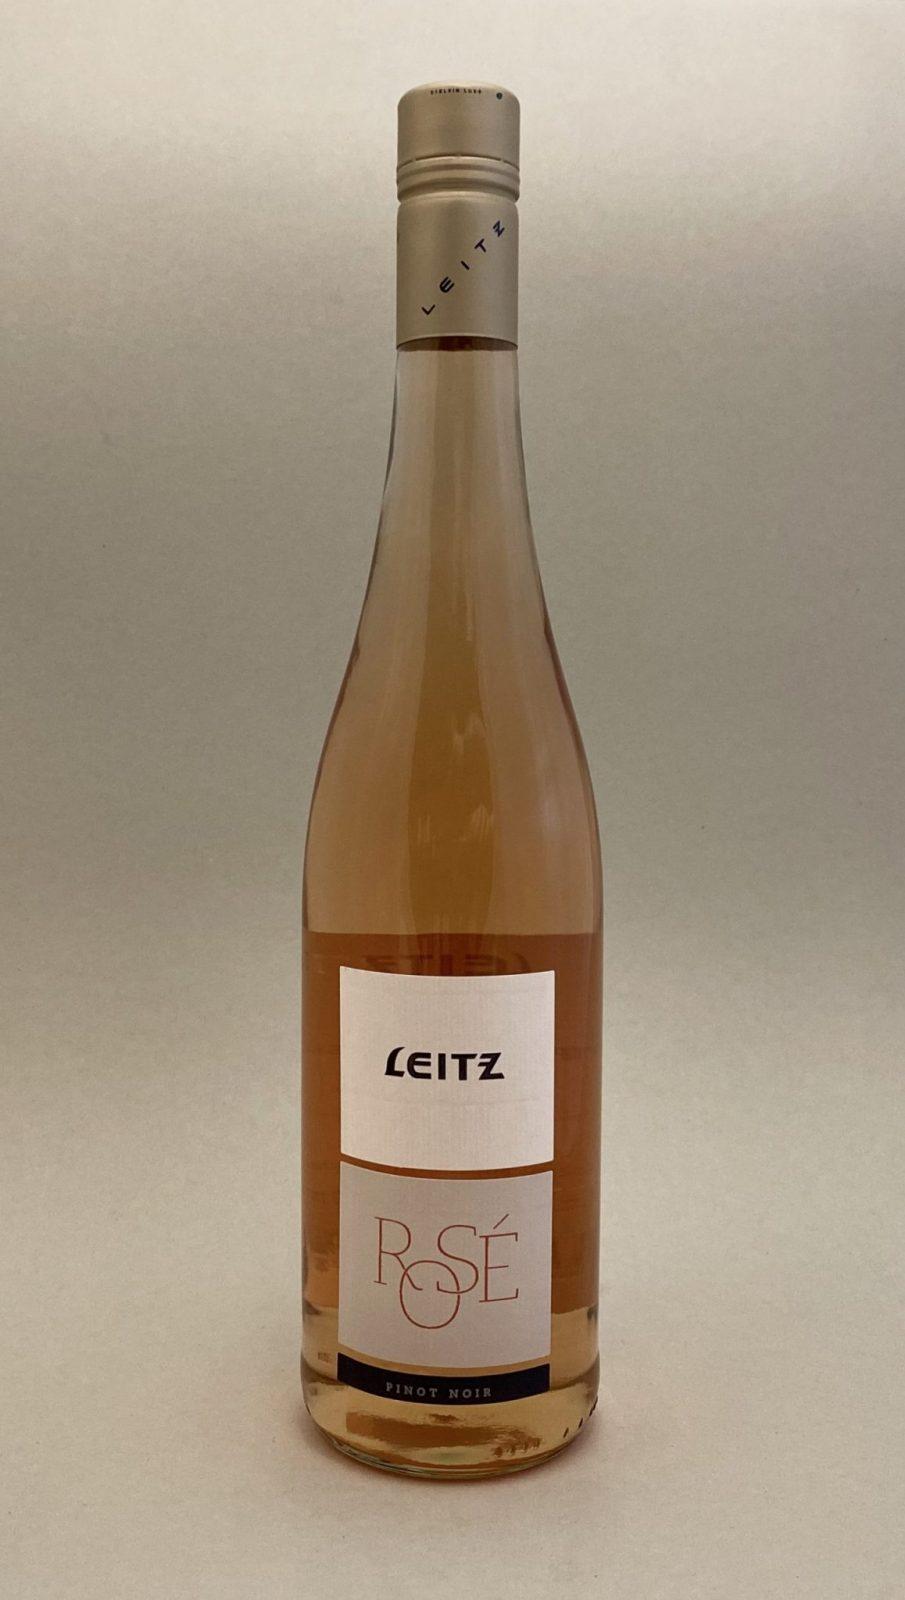 LEITZ Pinot Noir Rosé, vinoteka Sunny wines slnecnice mesto, Bratislava petrzalka, vino ružové z Nemecka